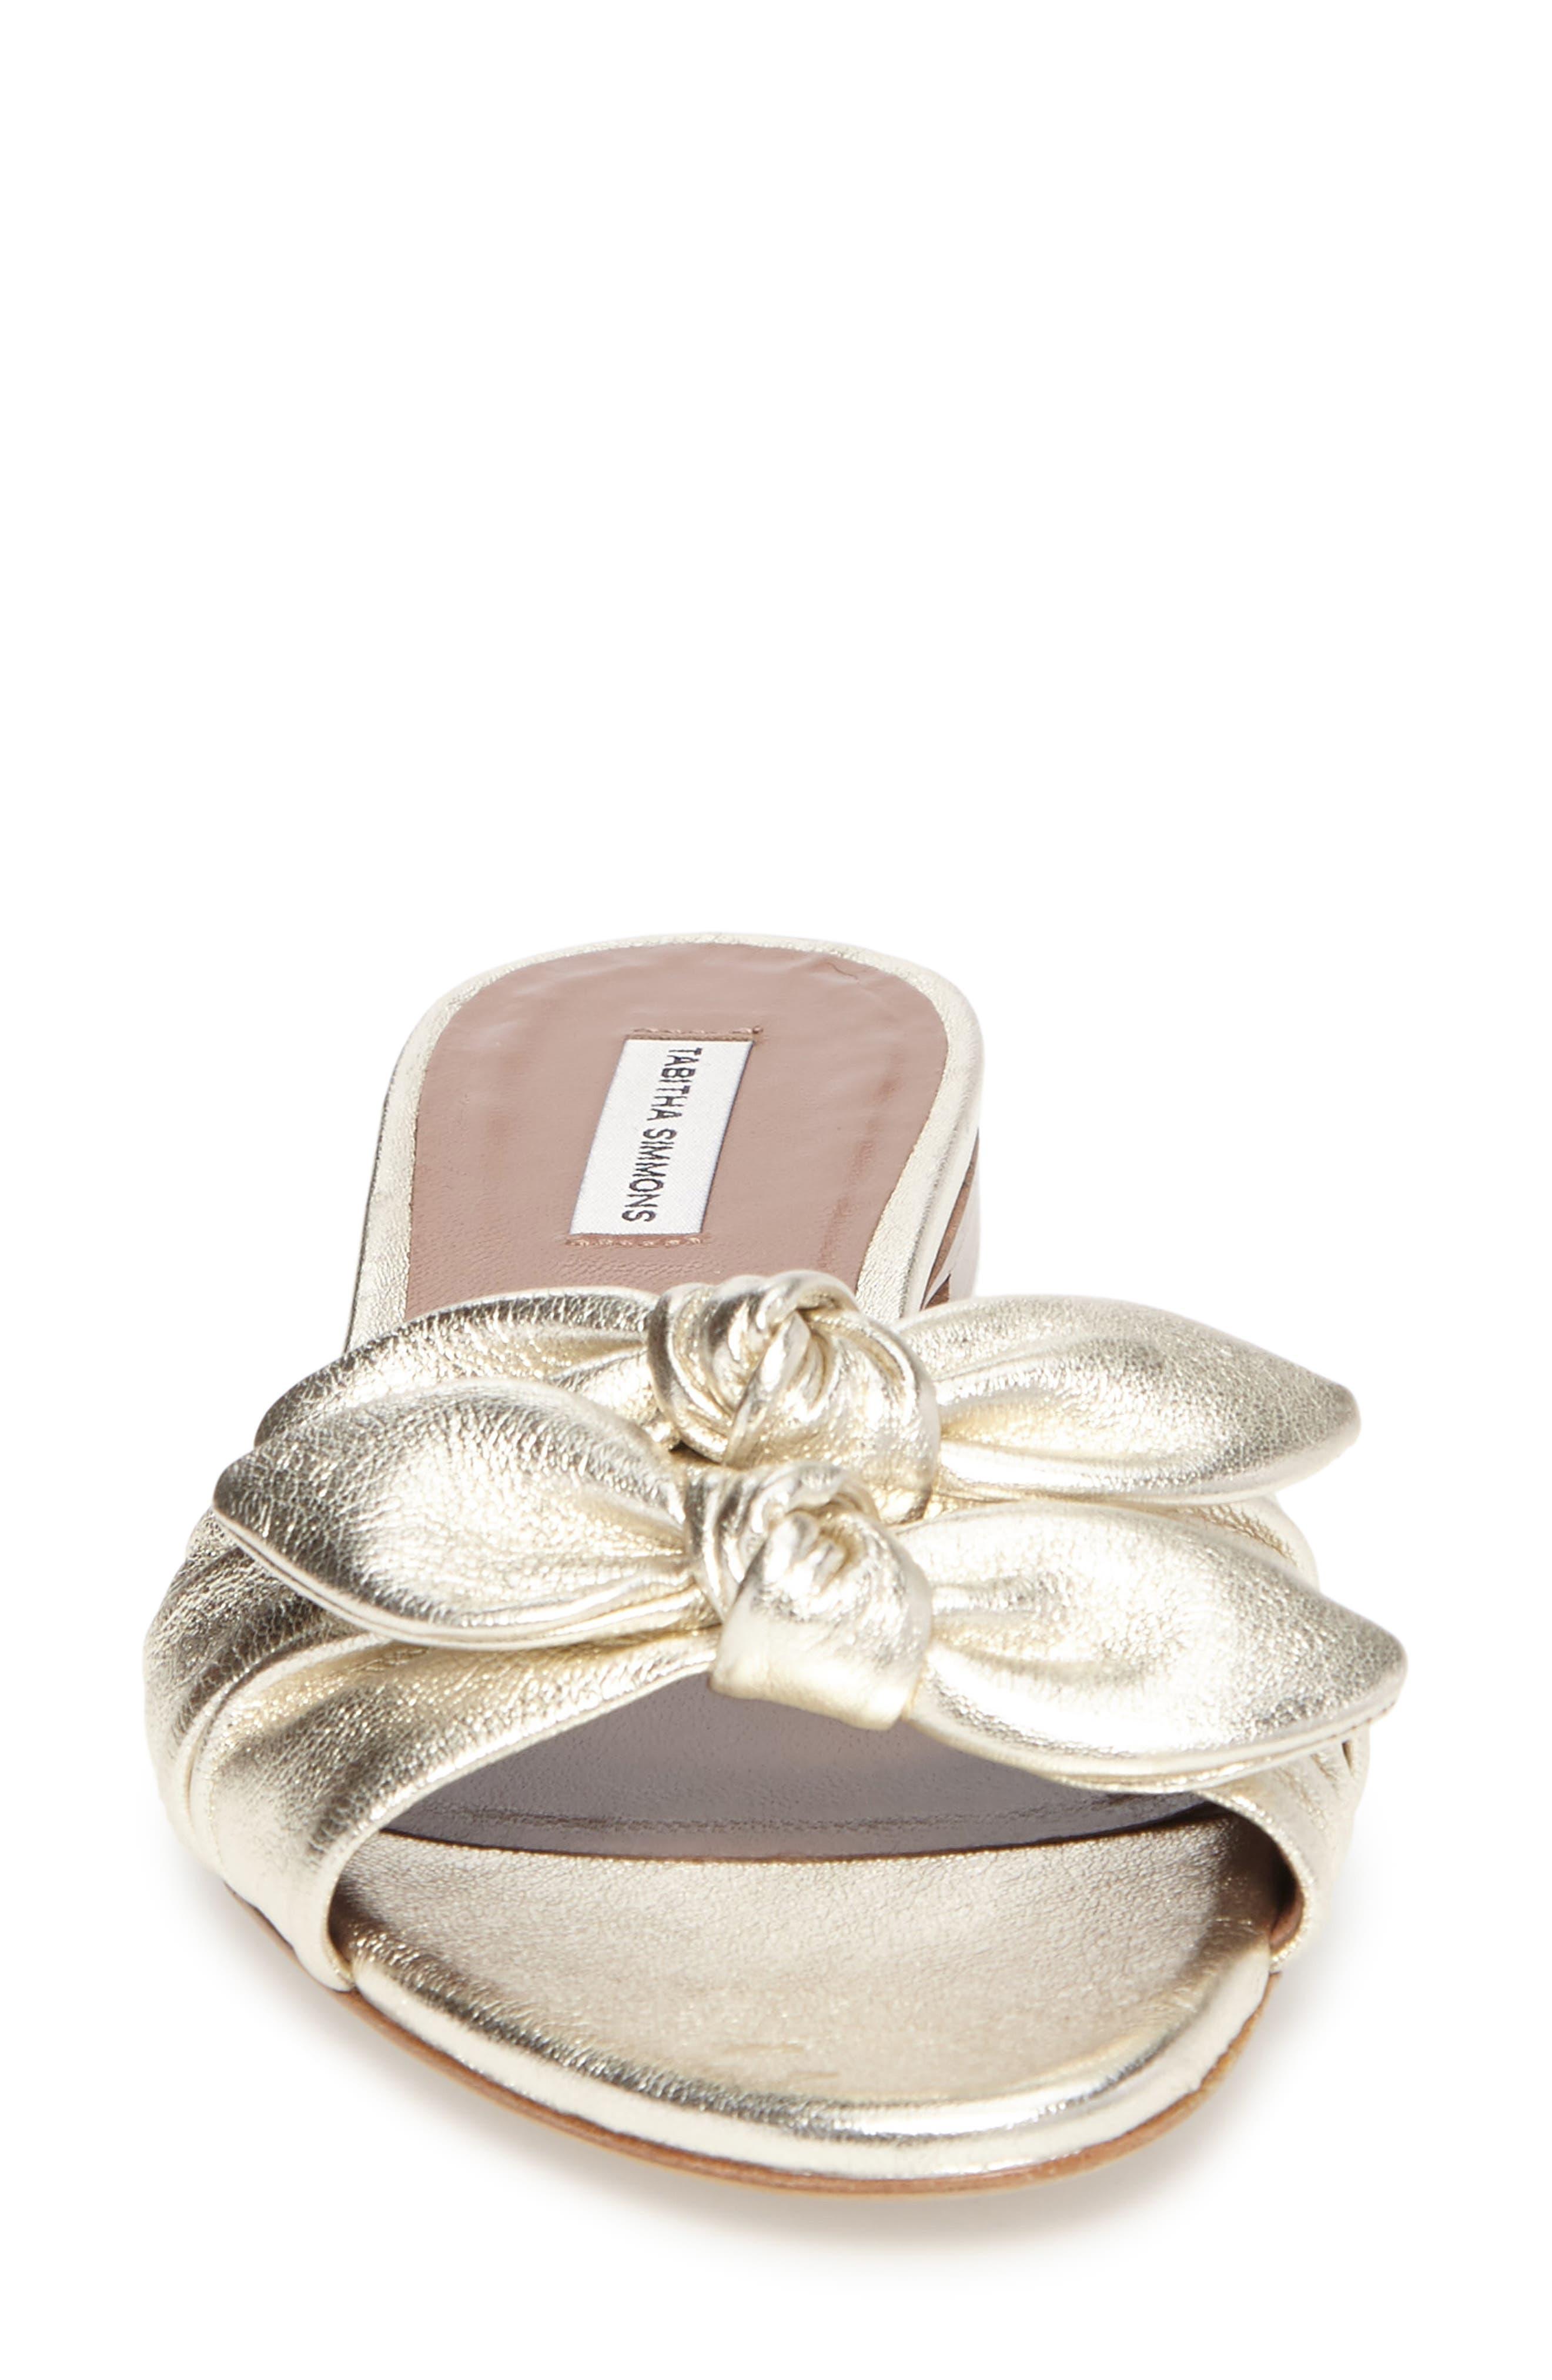 Cleo Knotted Bow Slide Sandal,                             Alternate thumbnail 4, color,                             040